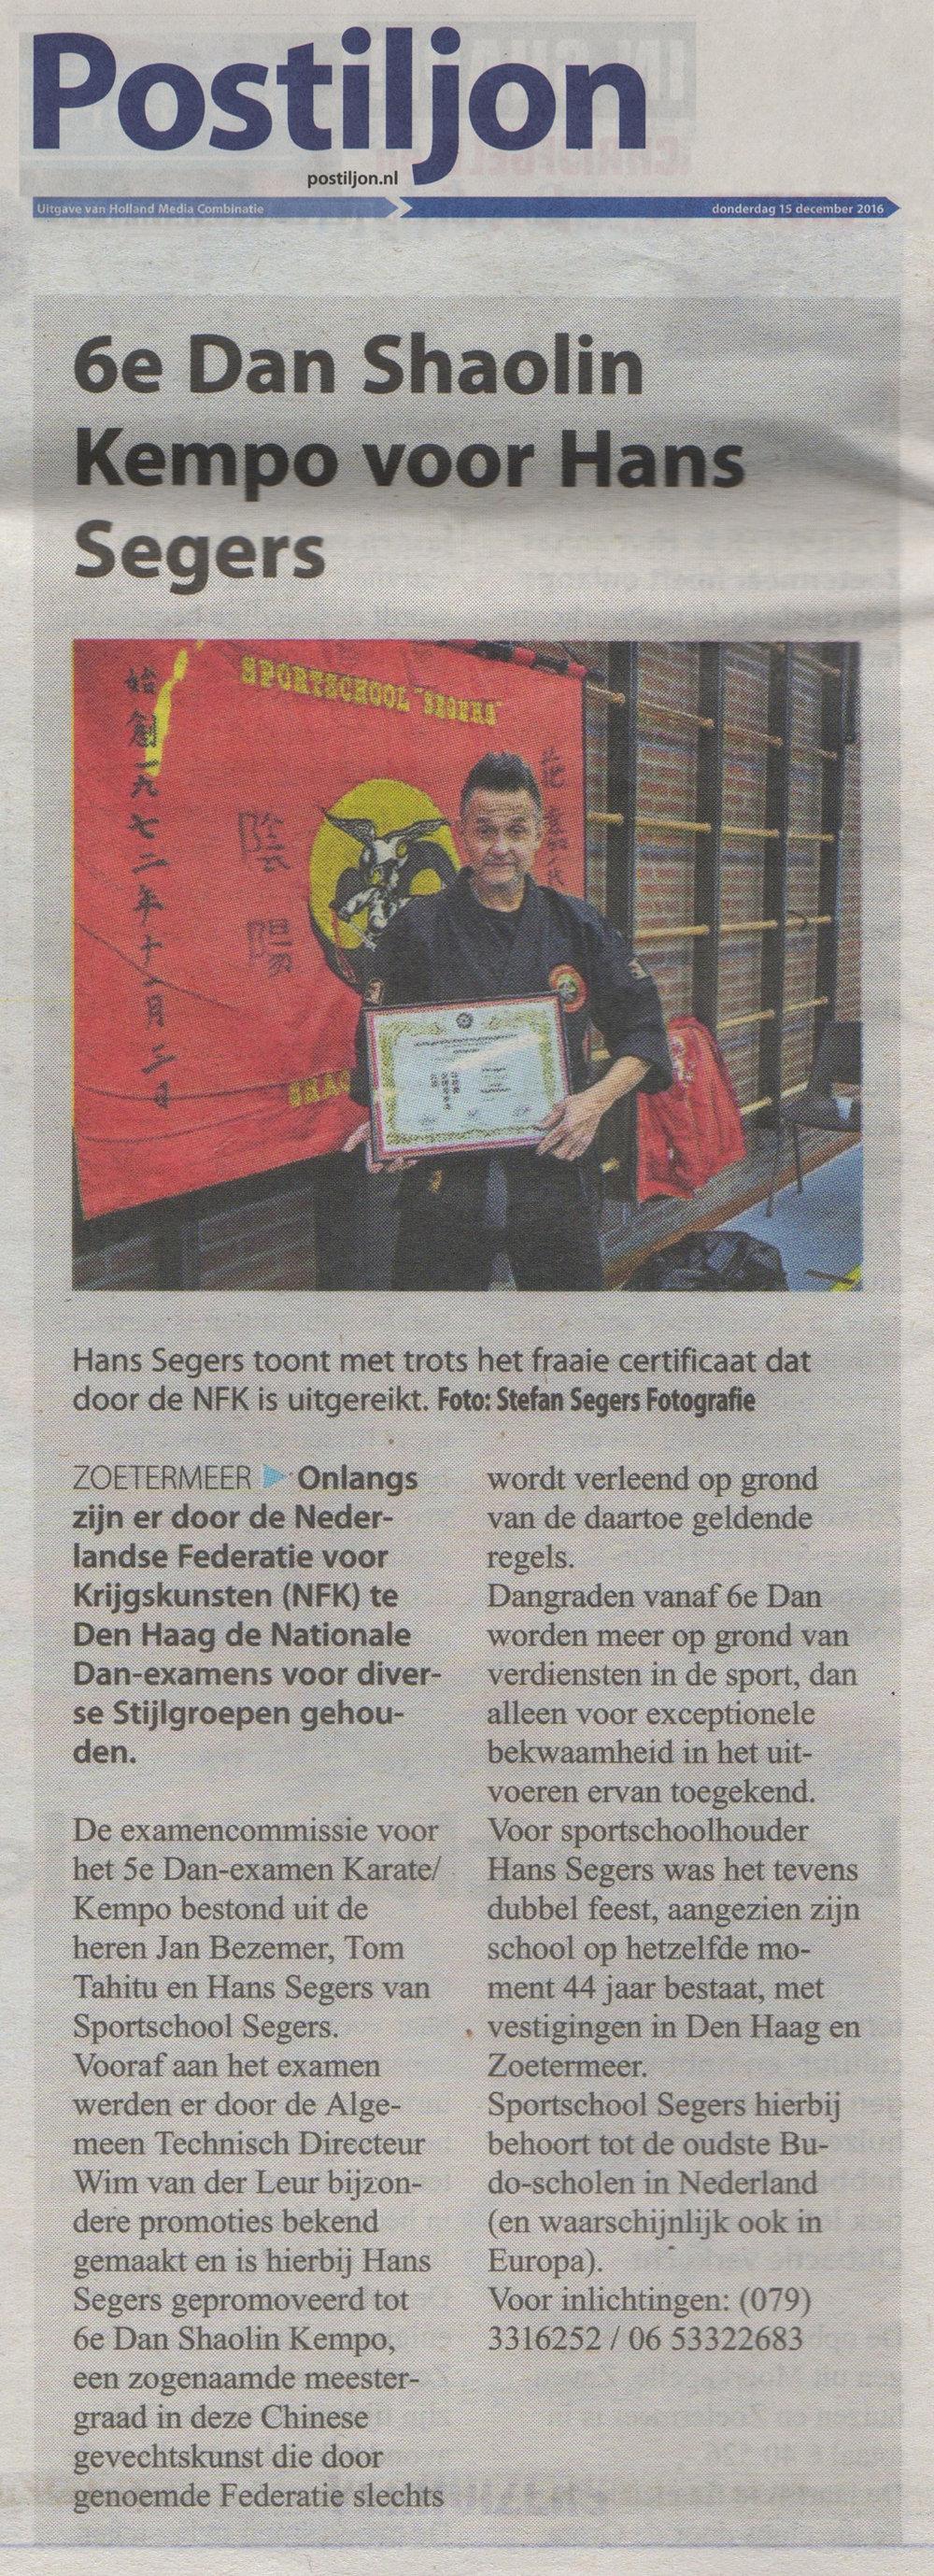 2016-12-15 6e Dan Shaolin Kempo voor Hans Segers.jpg